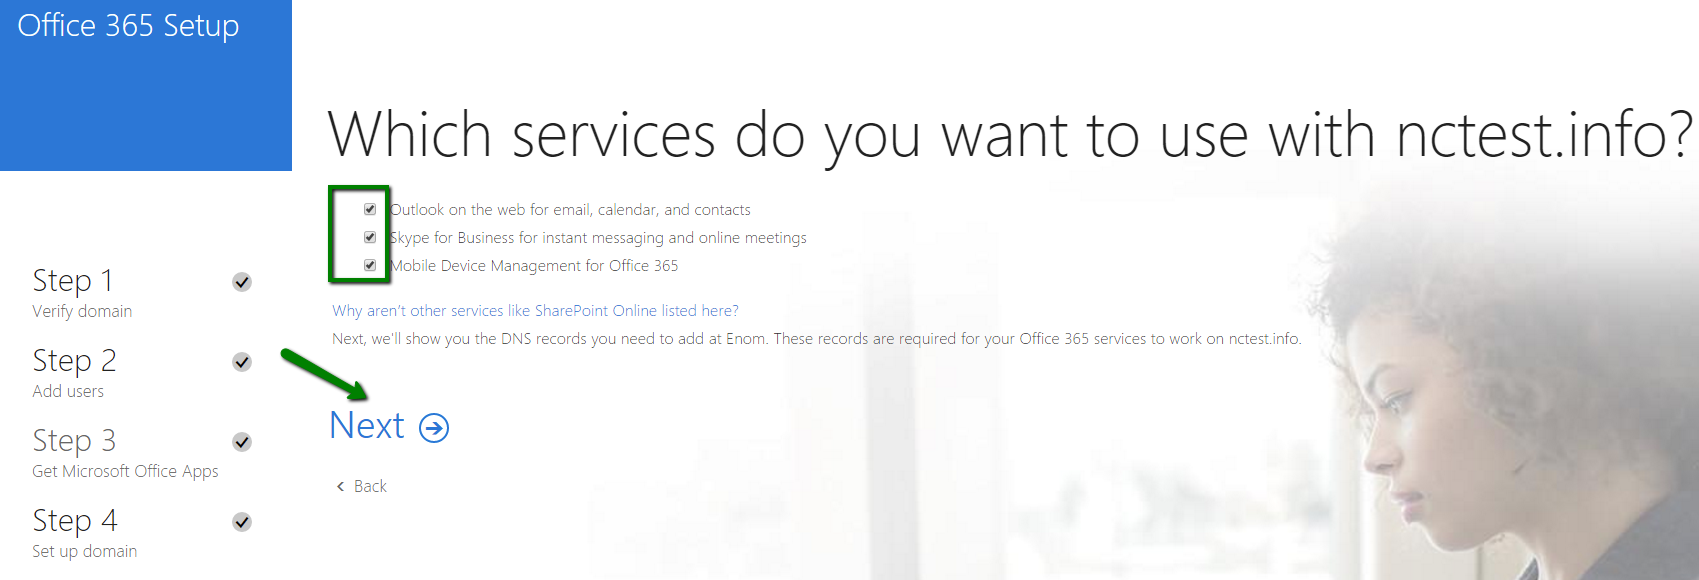 Setting up Office 365 with a Namecheap domain - Domains - Namecheap.com